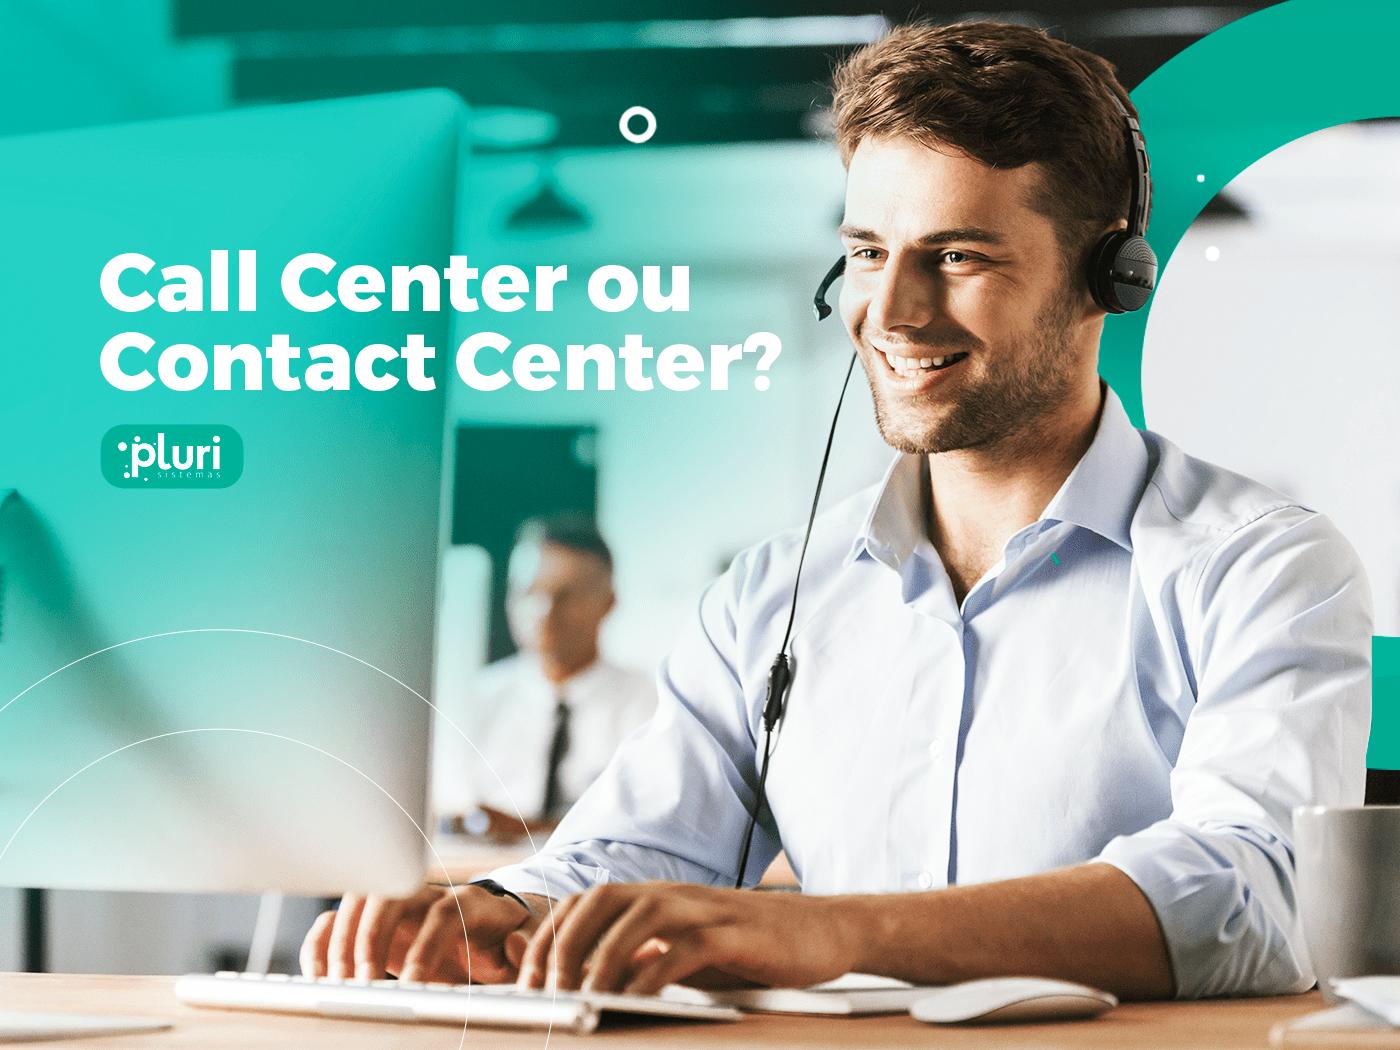 blog pluri sistemas call center contact center